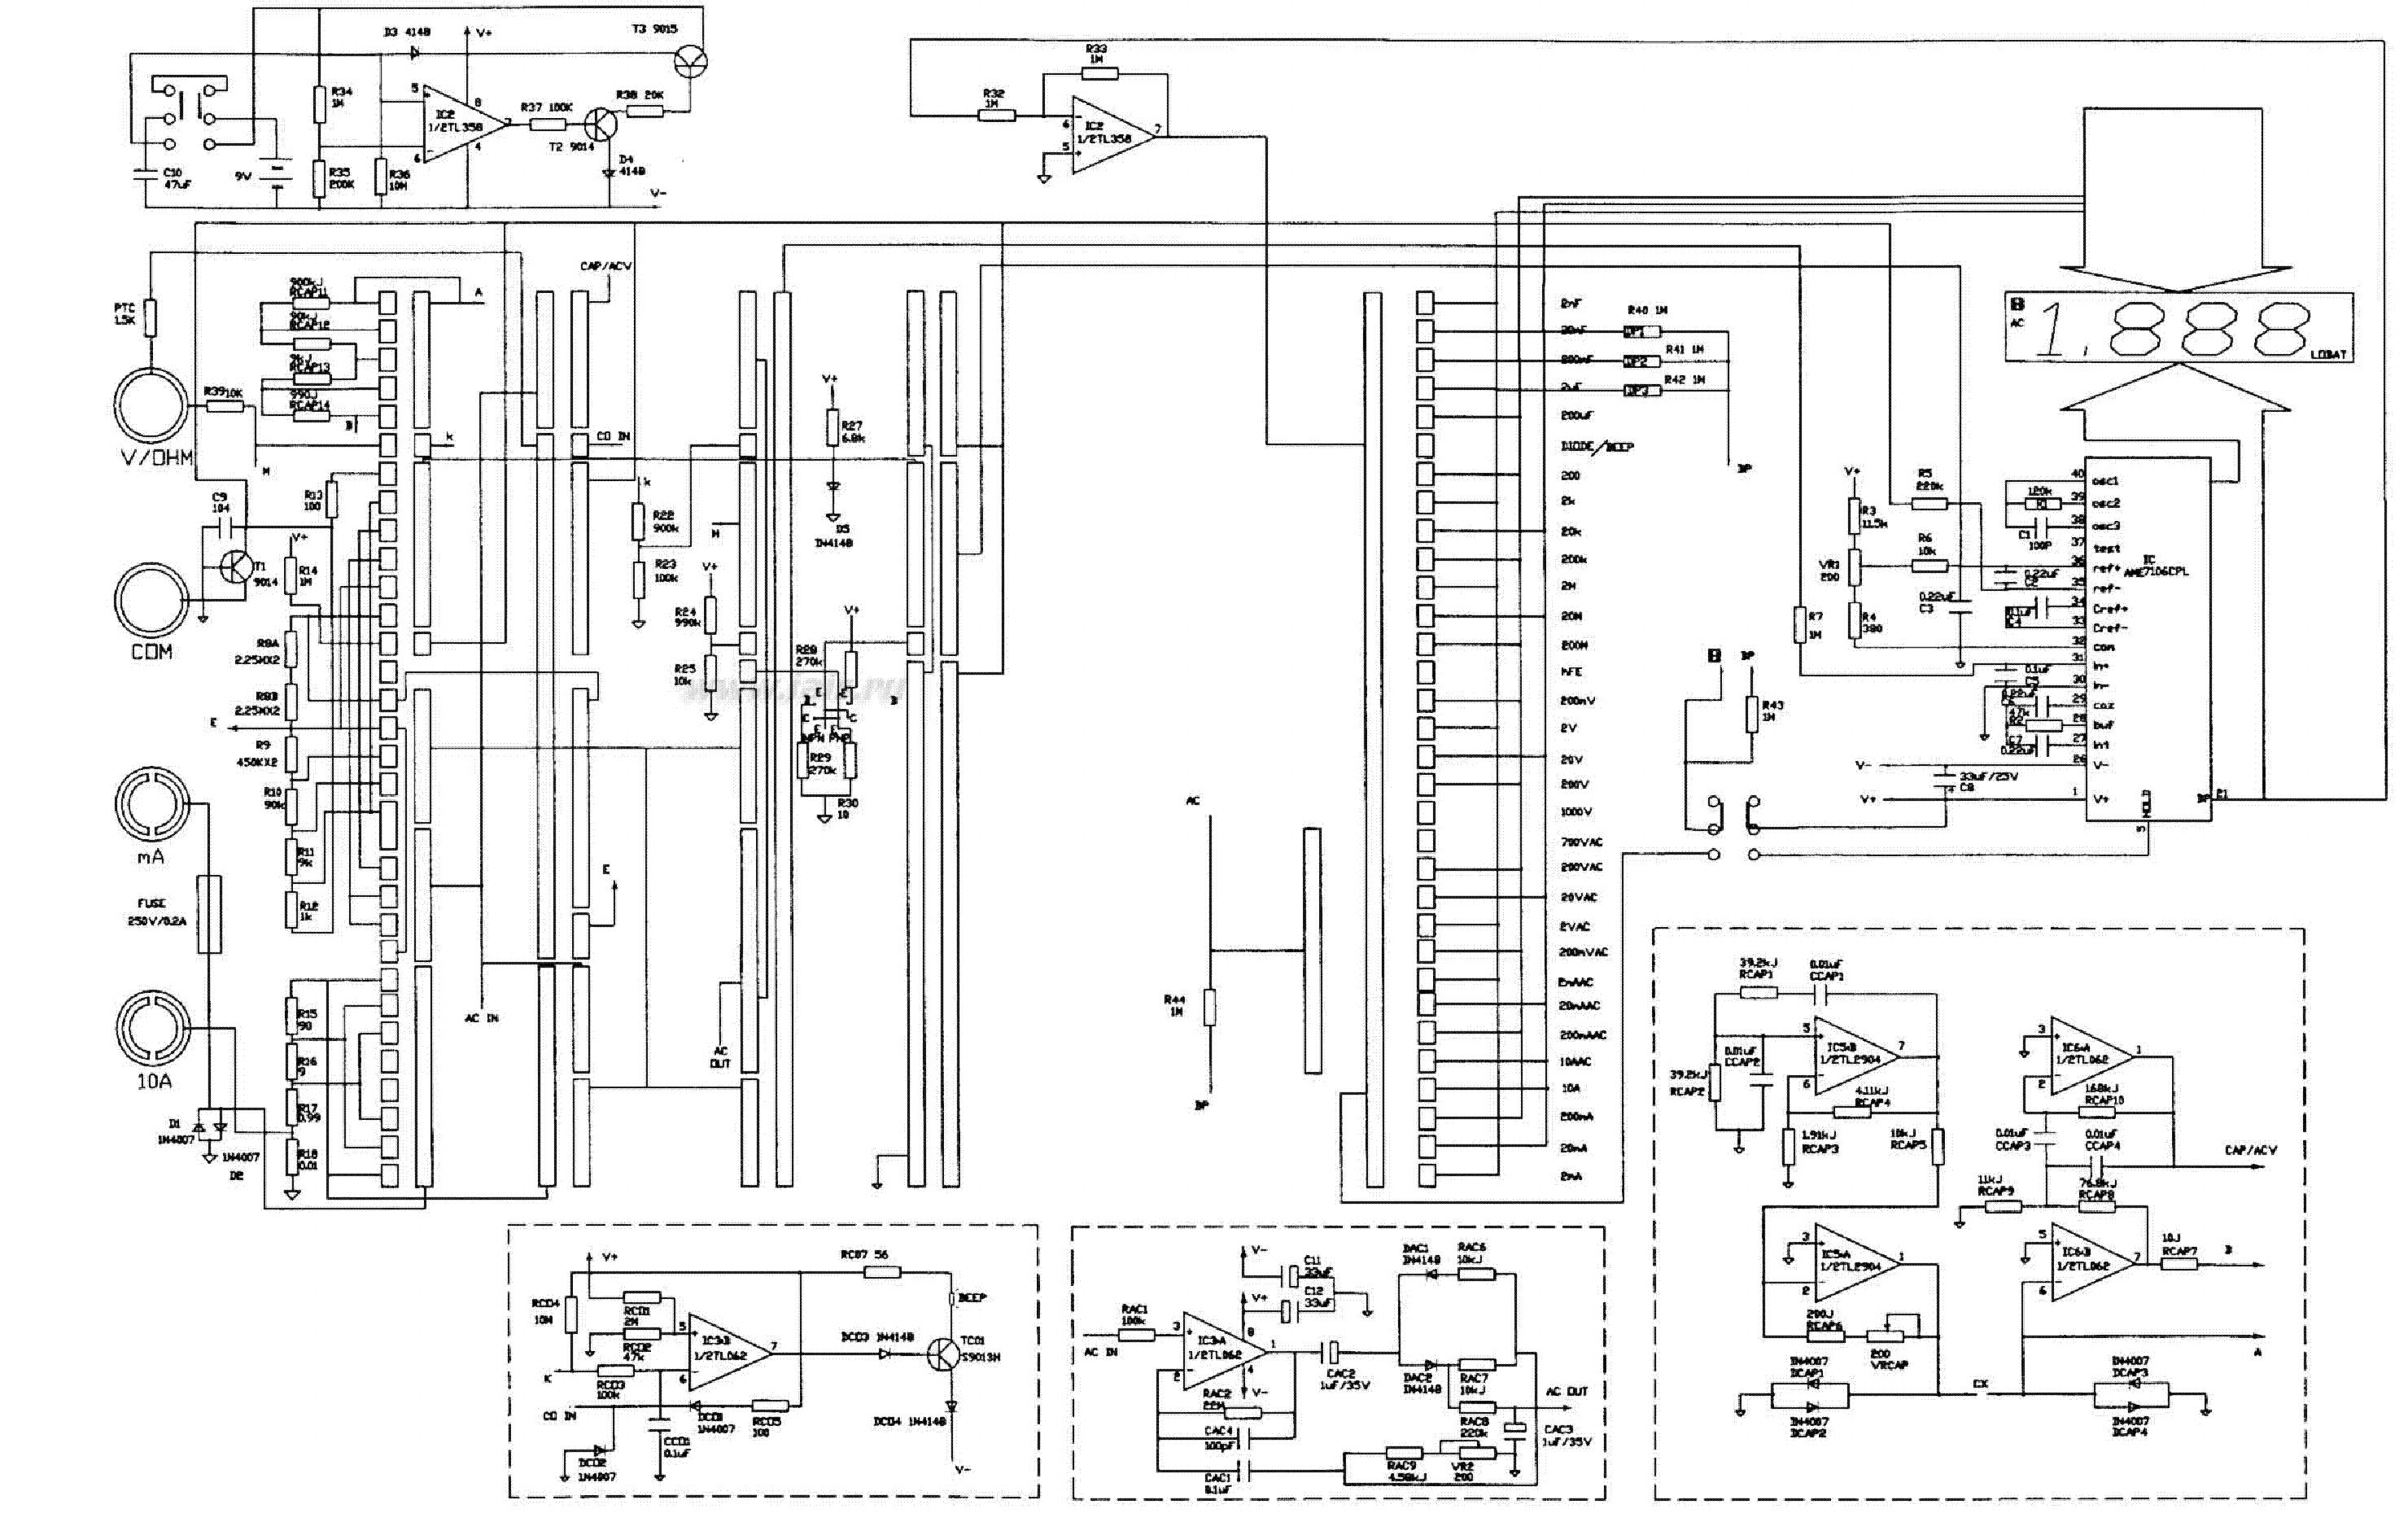 multimeter vc9802a sch service manual download  schematics